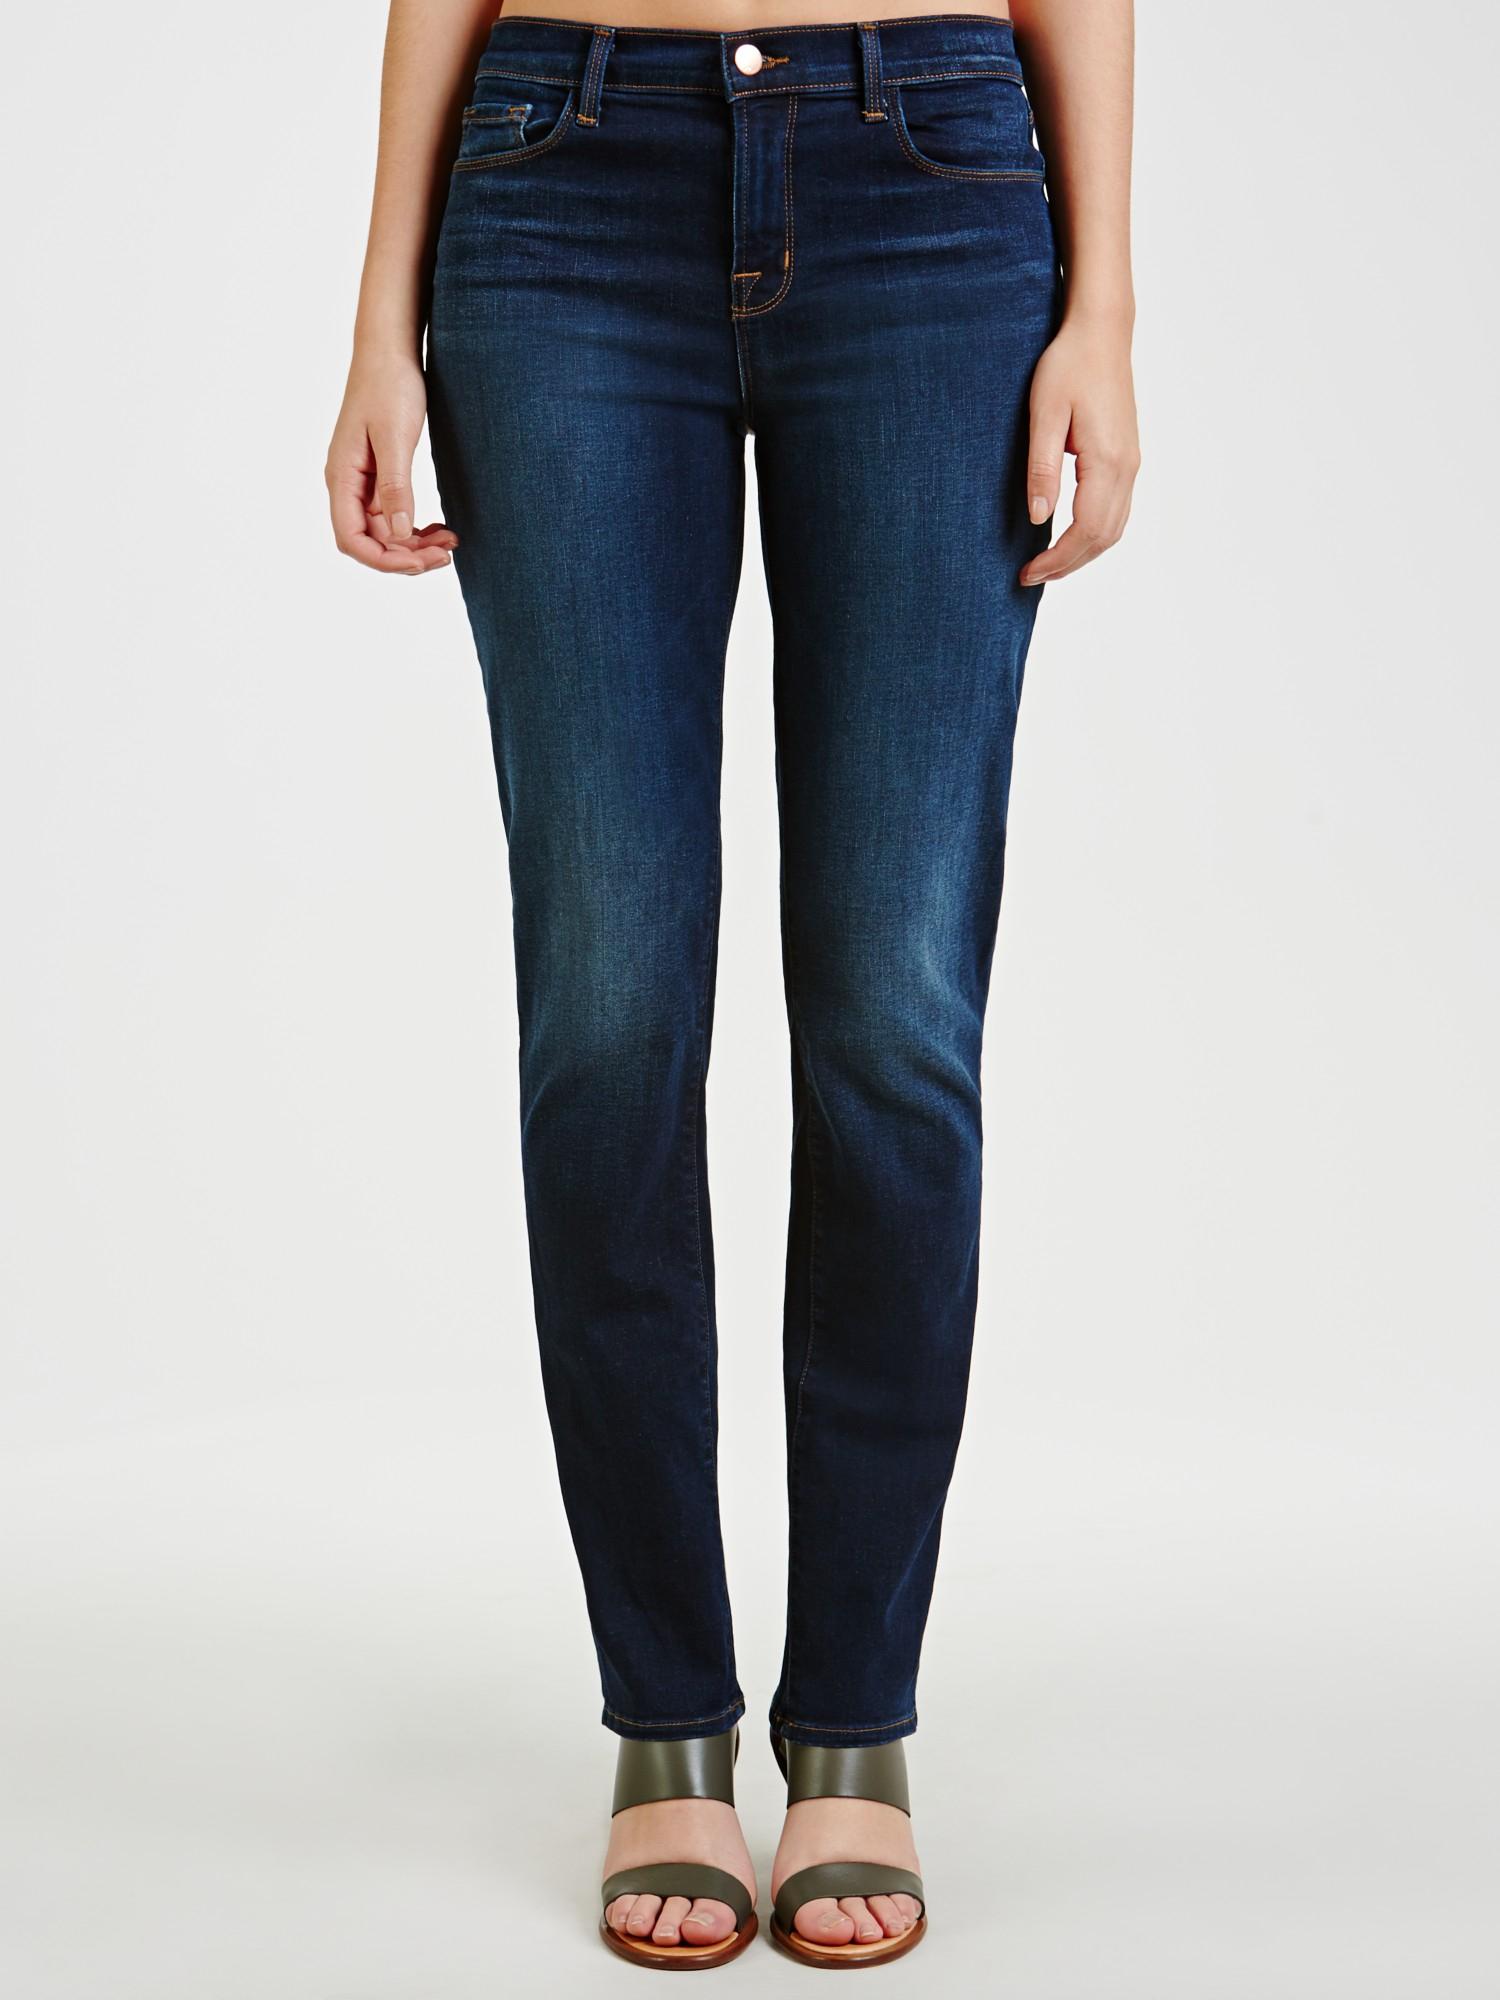 J Brand Denim Straight Leg Jeans in Blue